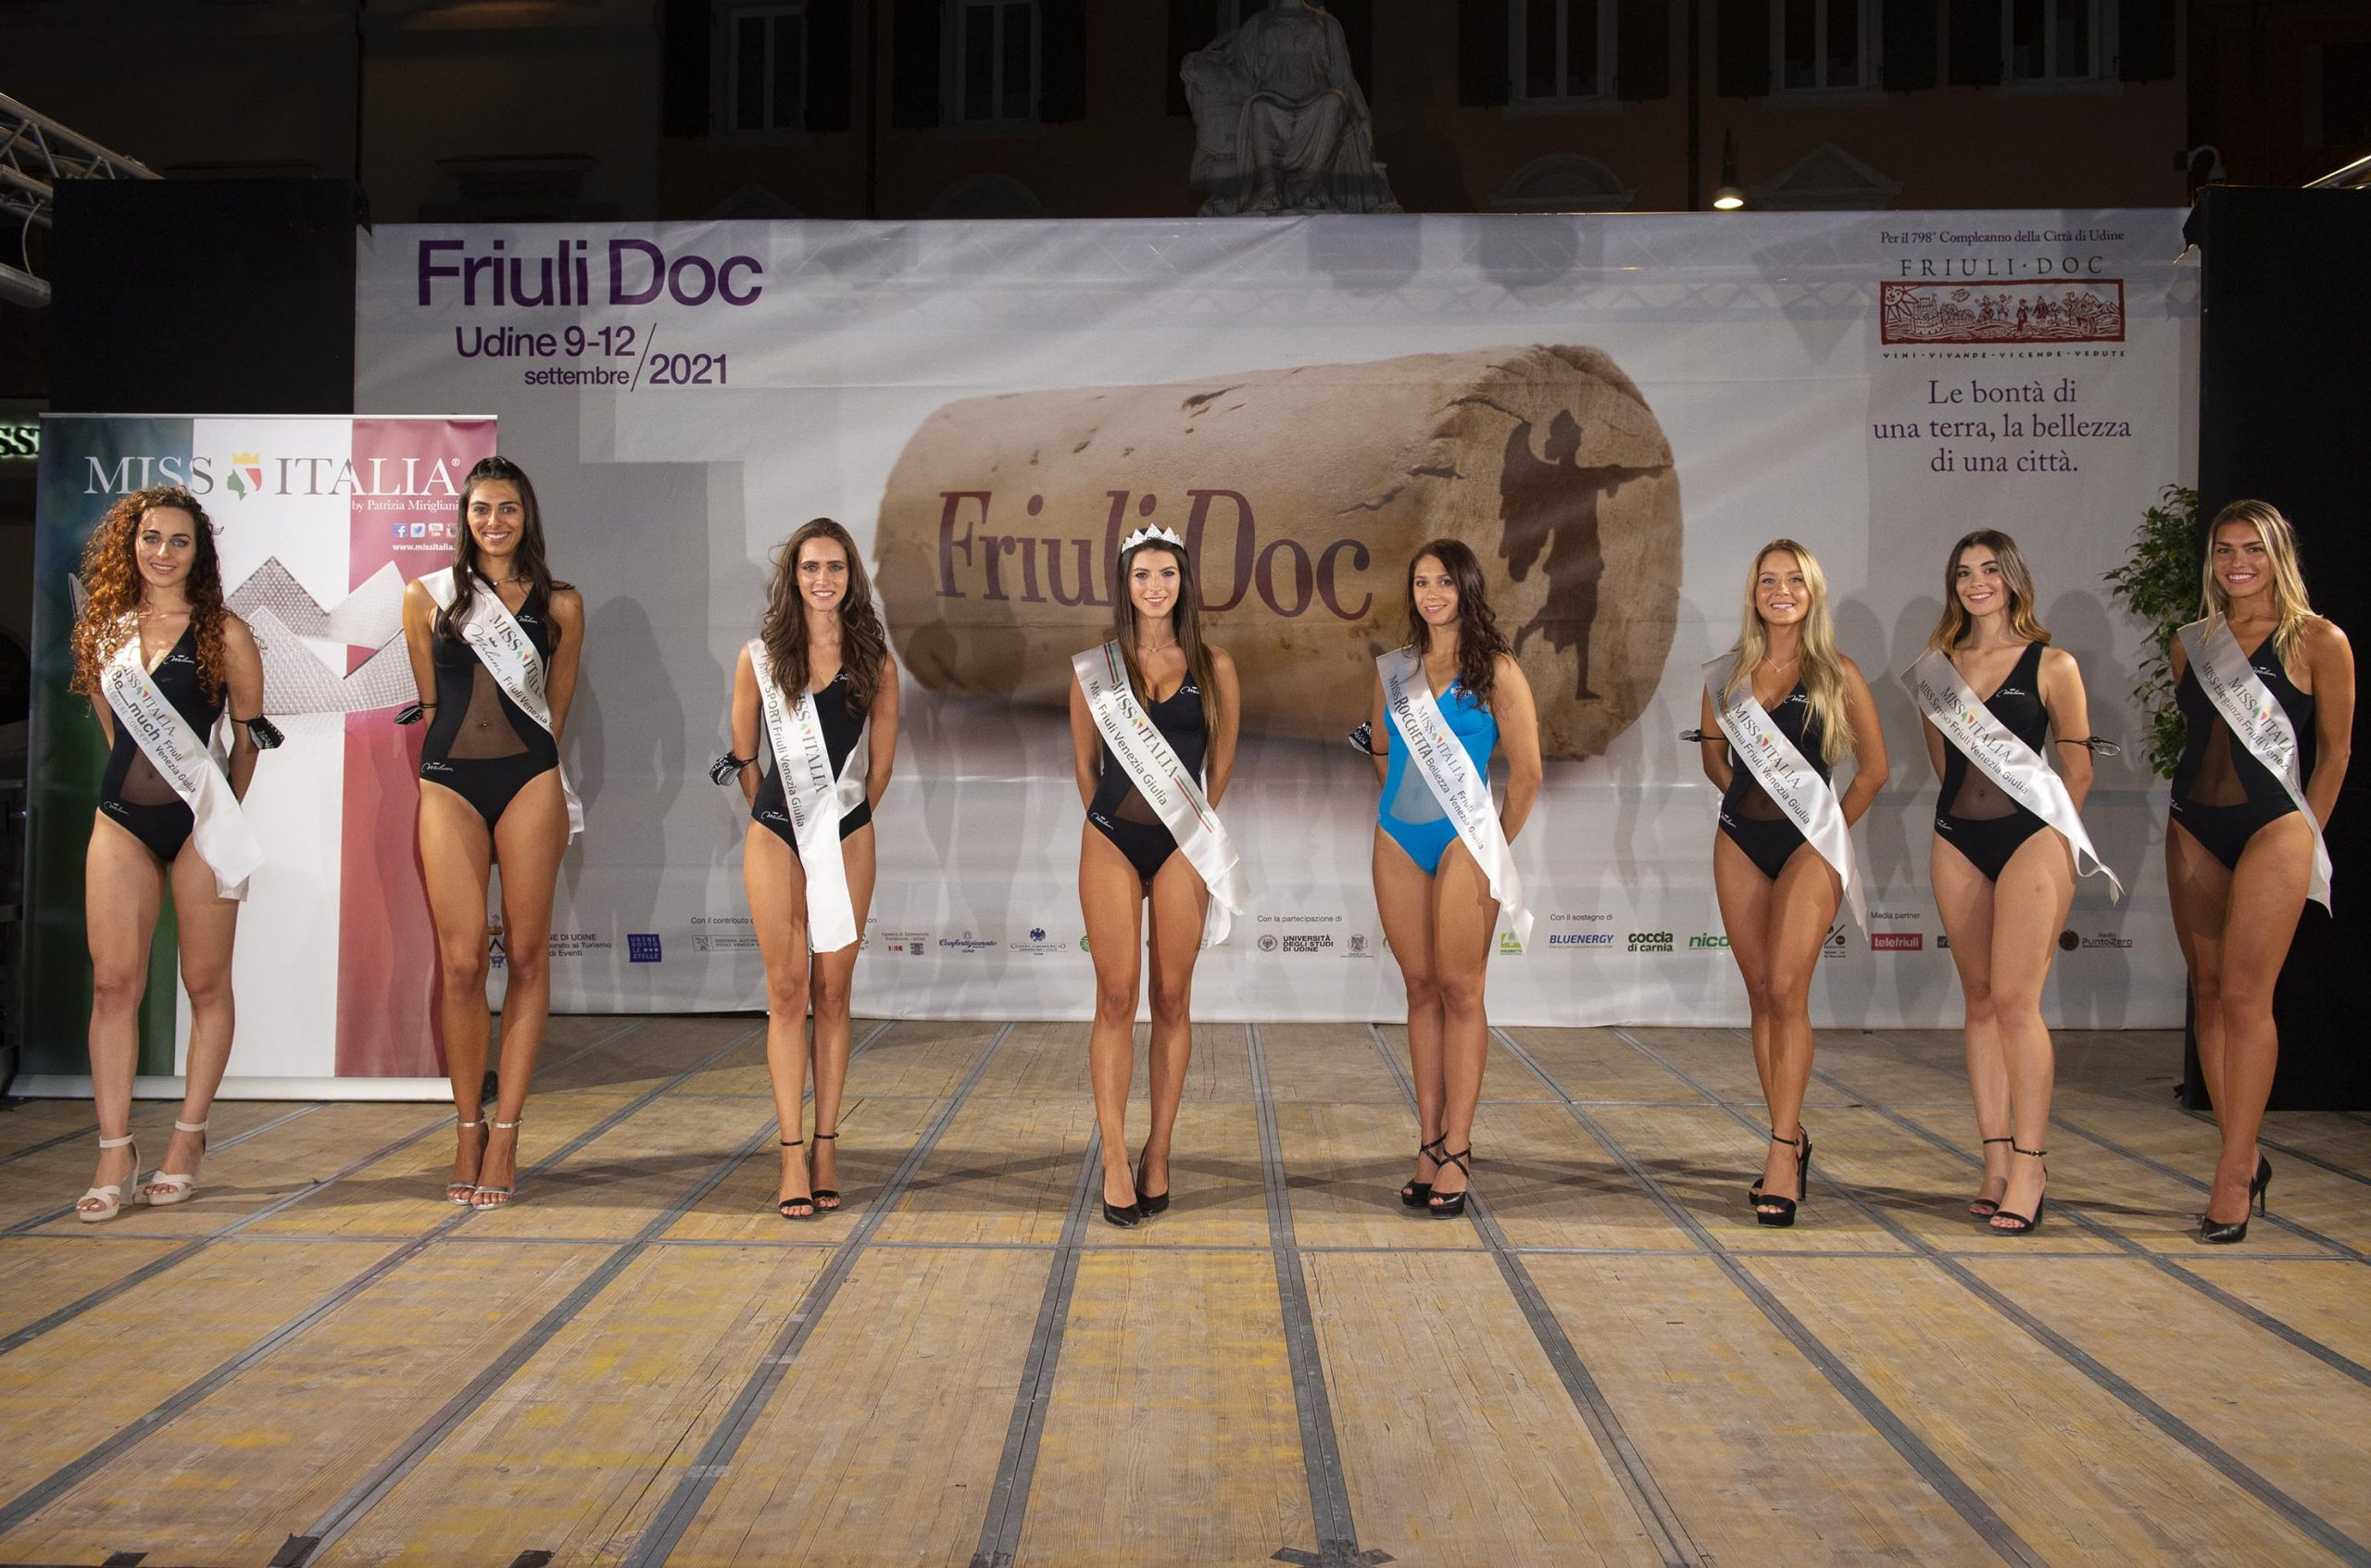 Gruppo Prefinaliste Friuli Venezia Giulia